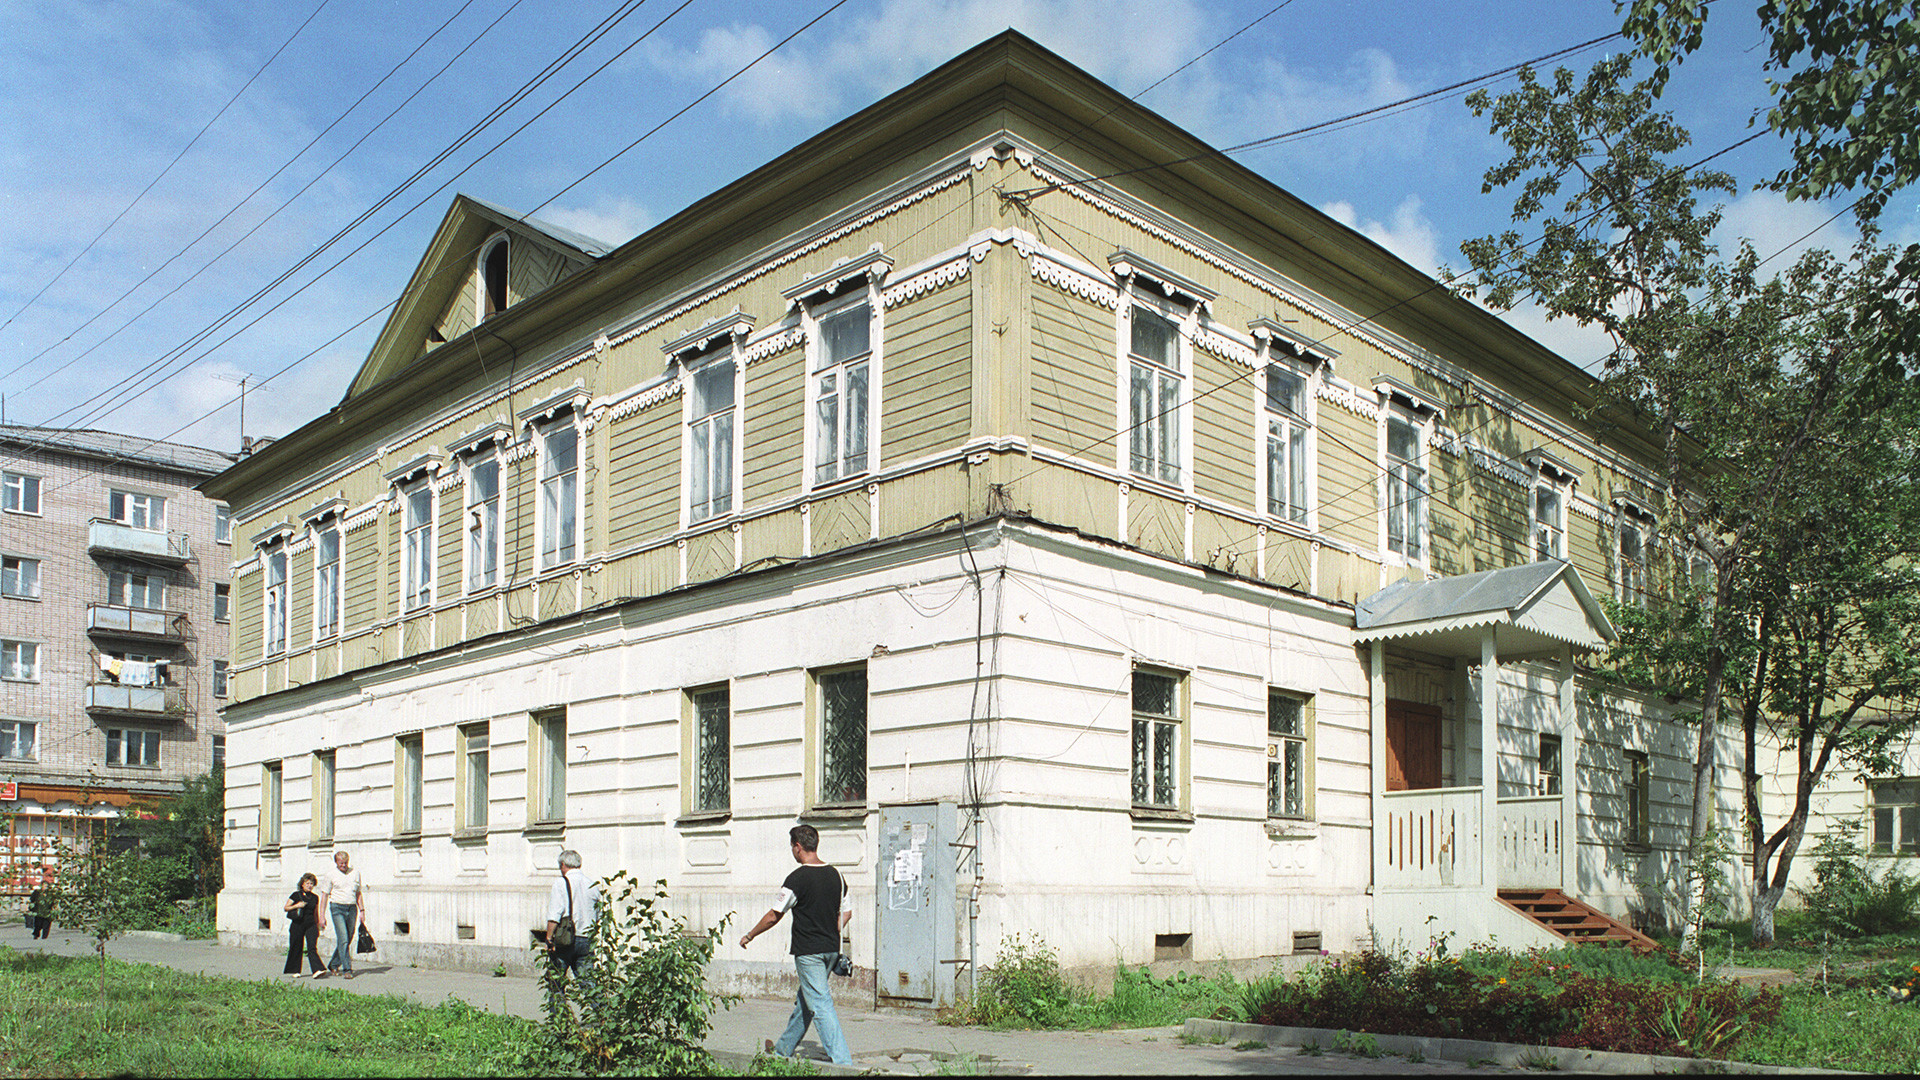 Vytegra. House of merchant Nikolay Veretennikov (built in 1894). August 28, 2006